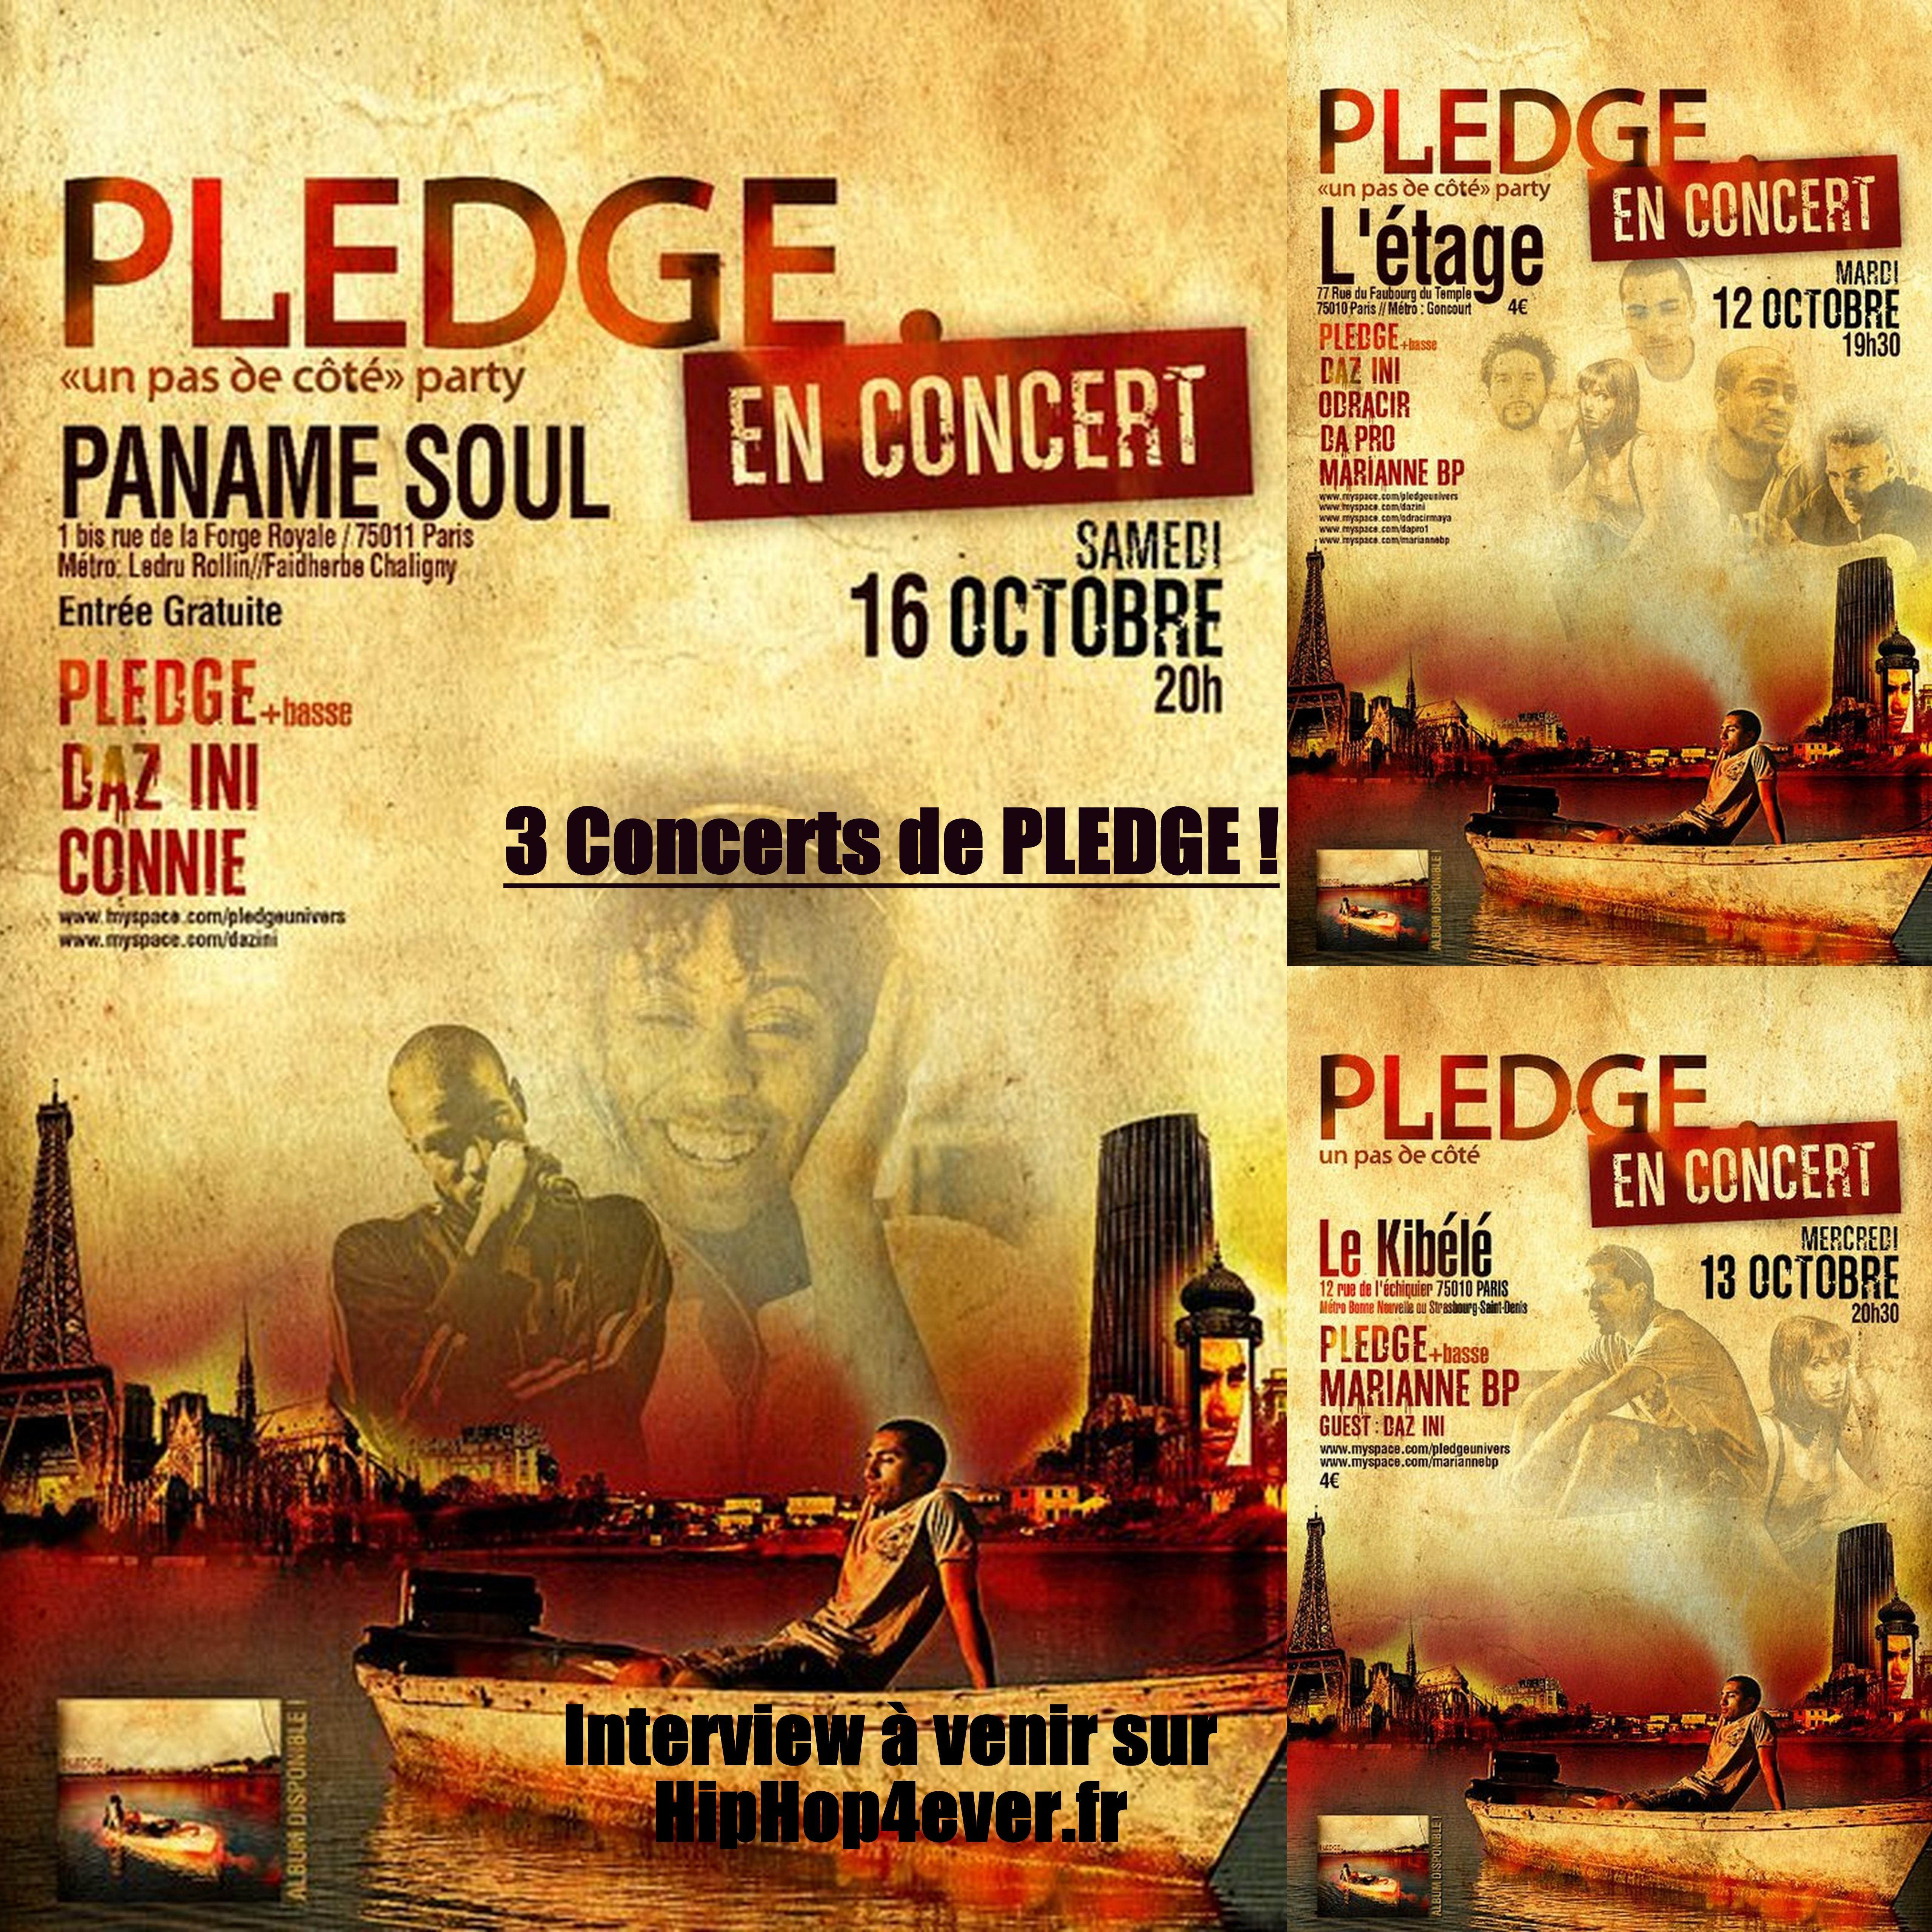 pledge-concerts